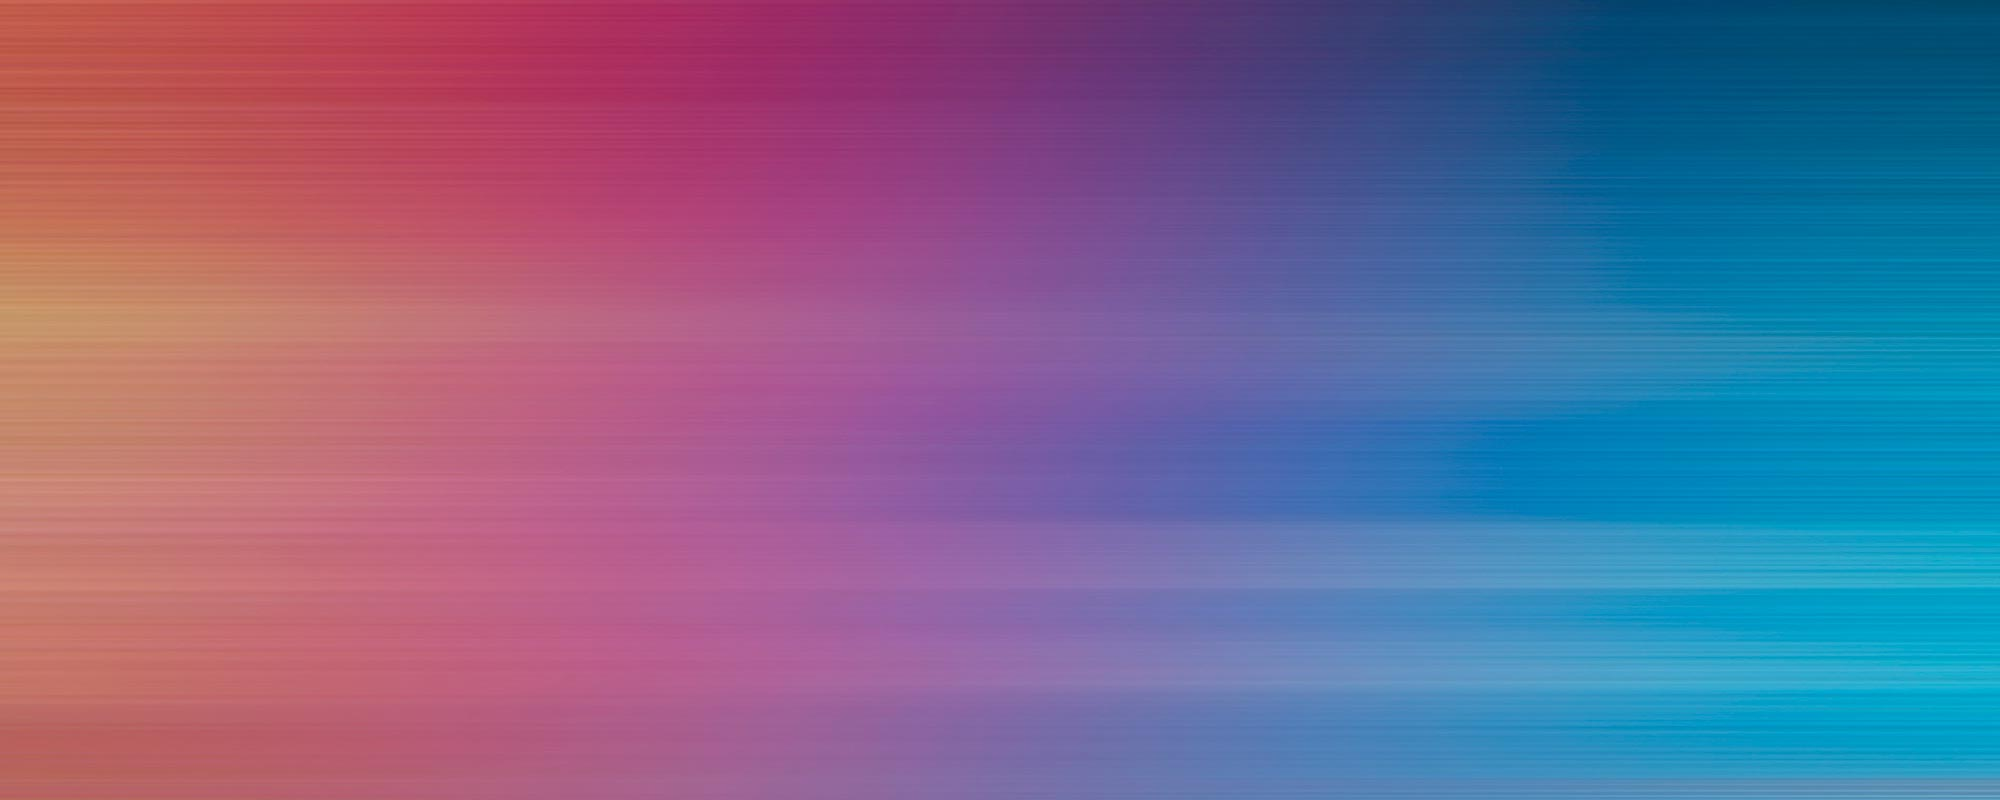 BG-colorblur.jpg